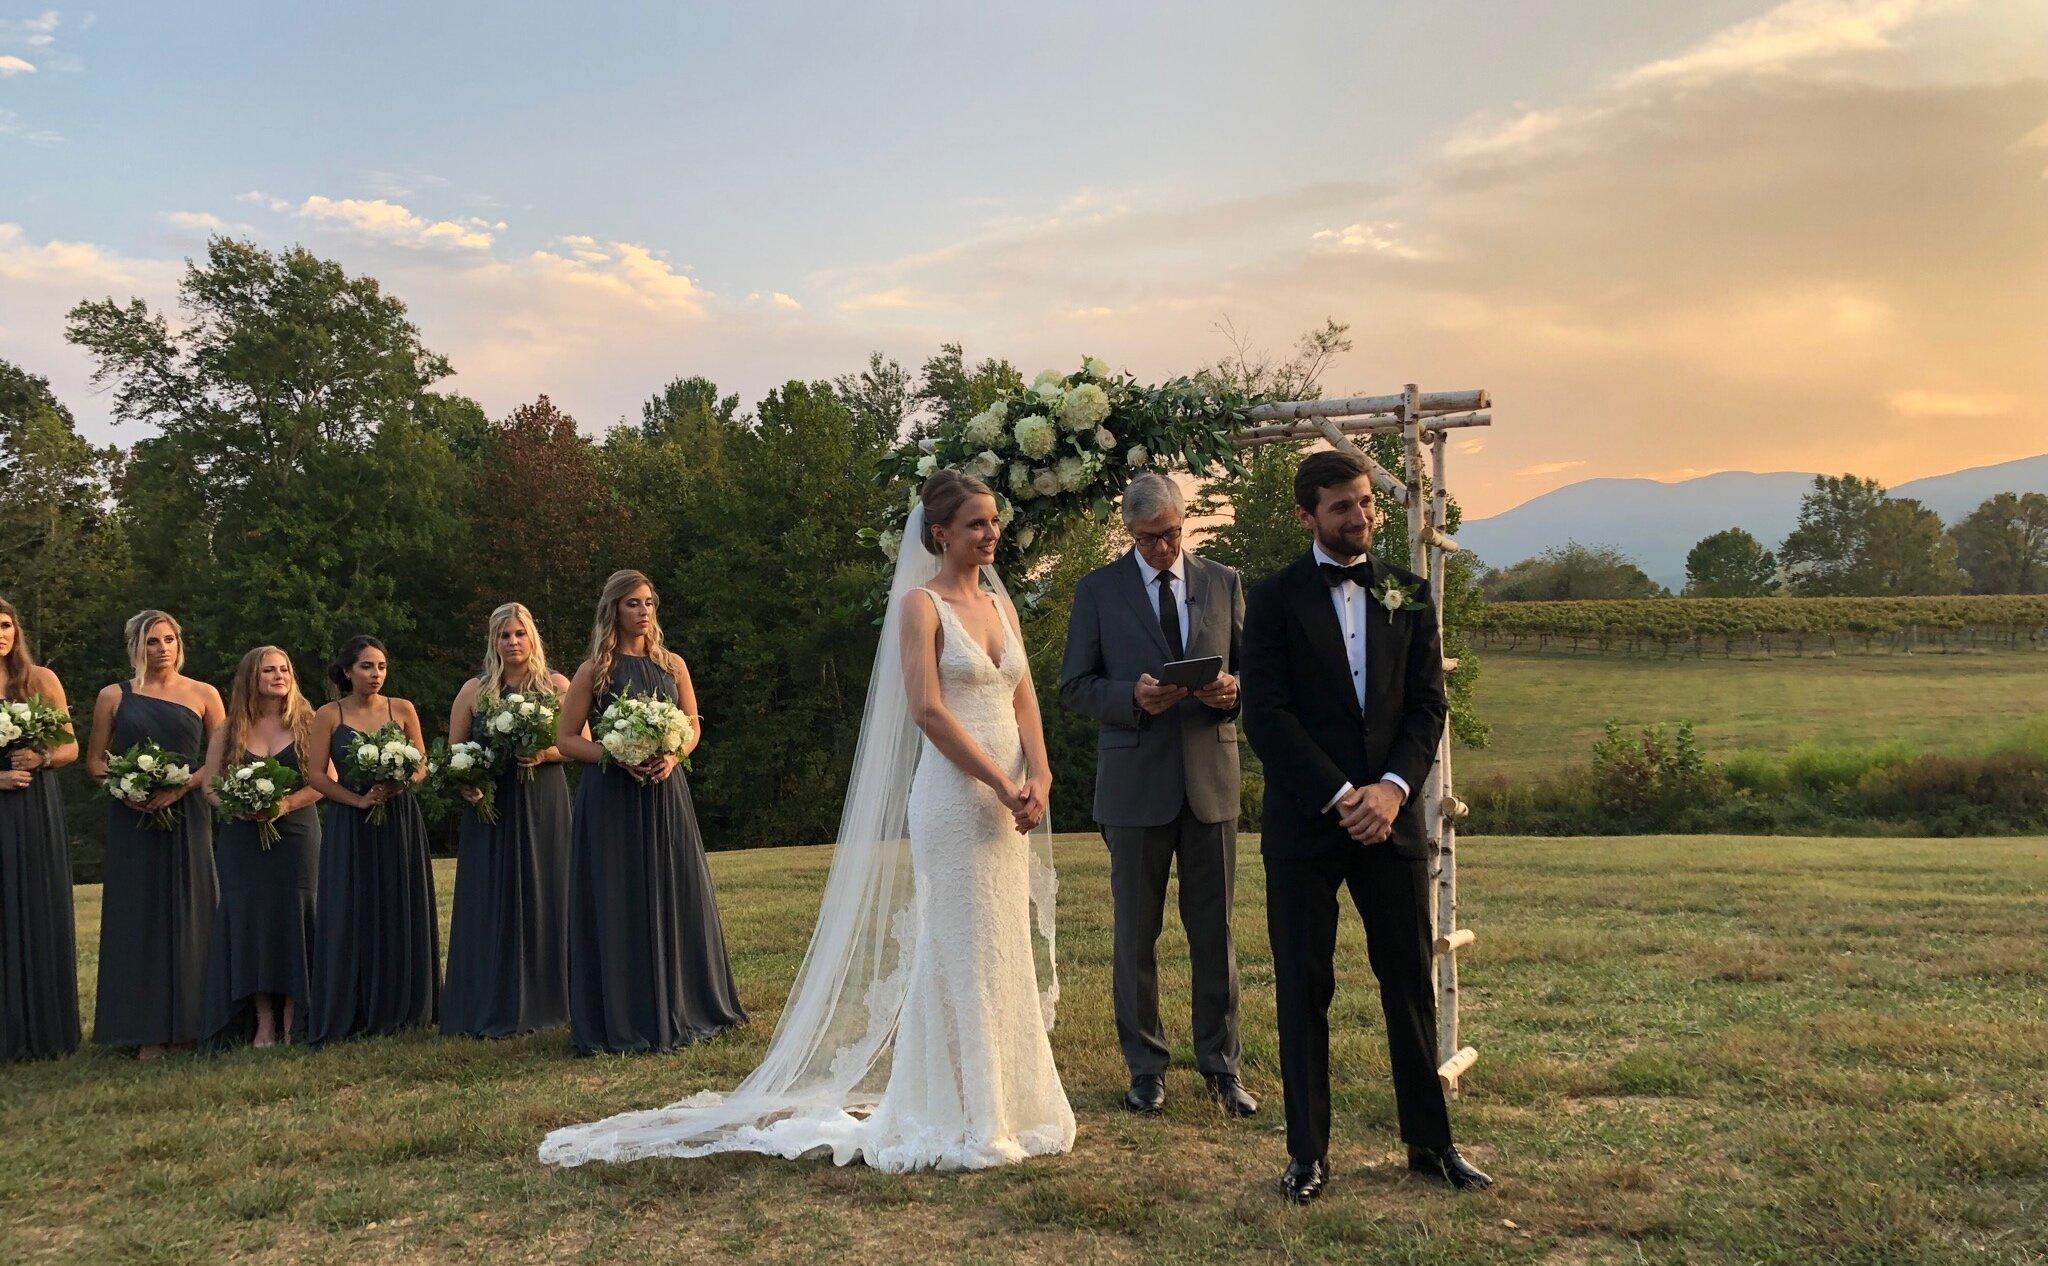 Risendal-Dorgeloh wedding.jpg